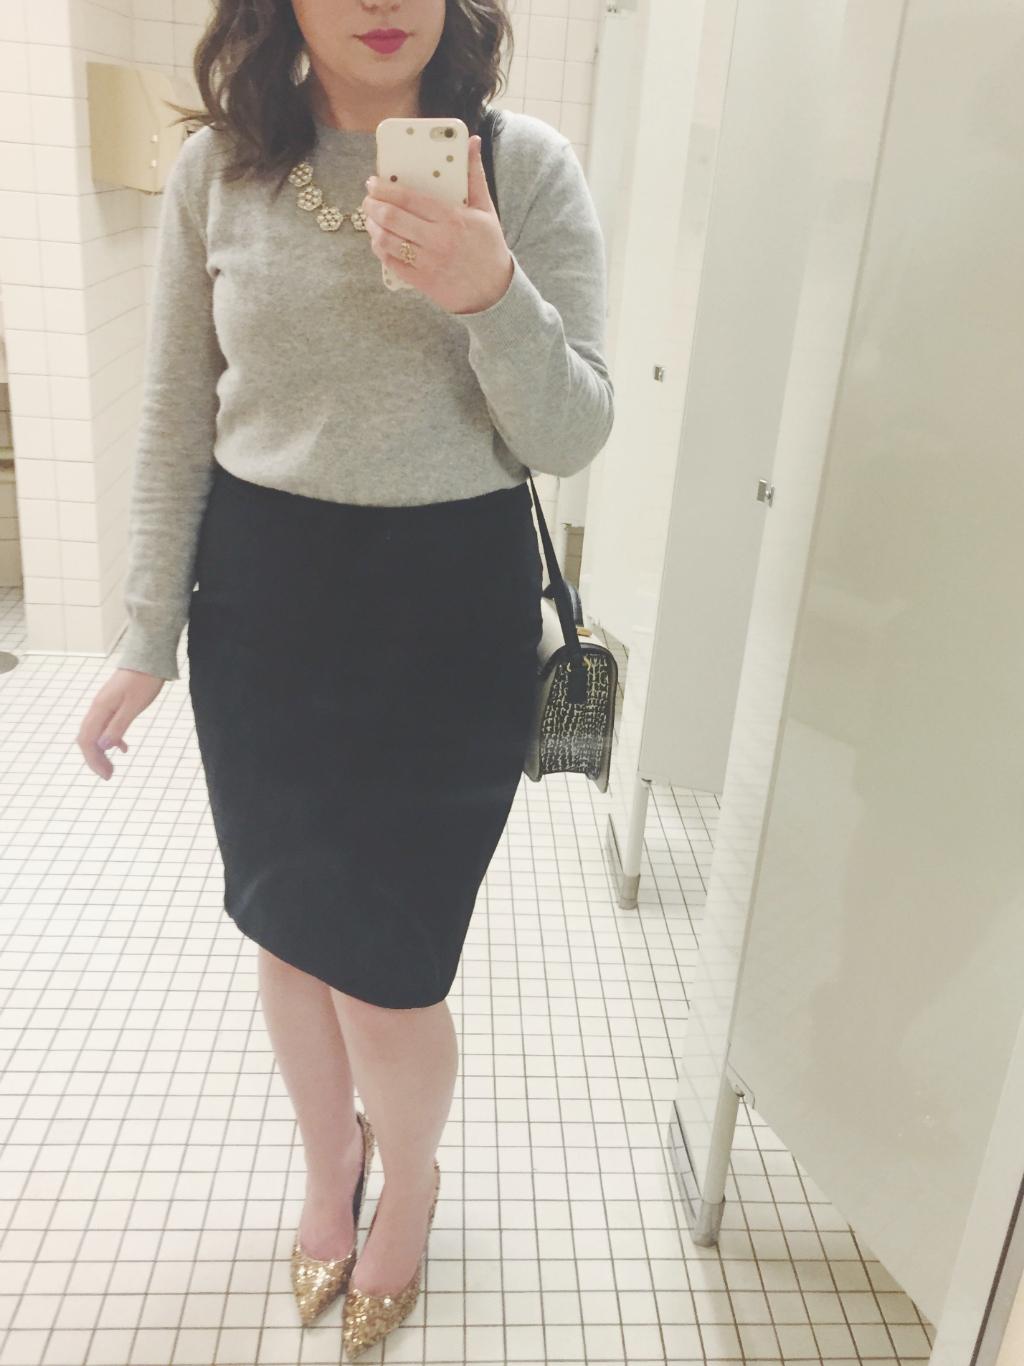 greysweaterandpencilskirt